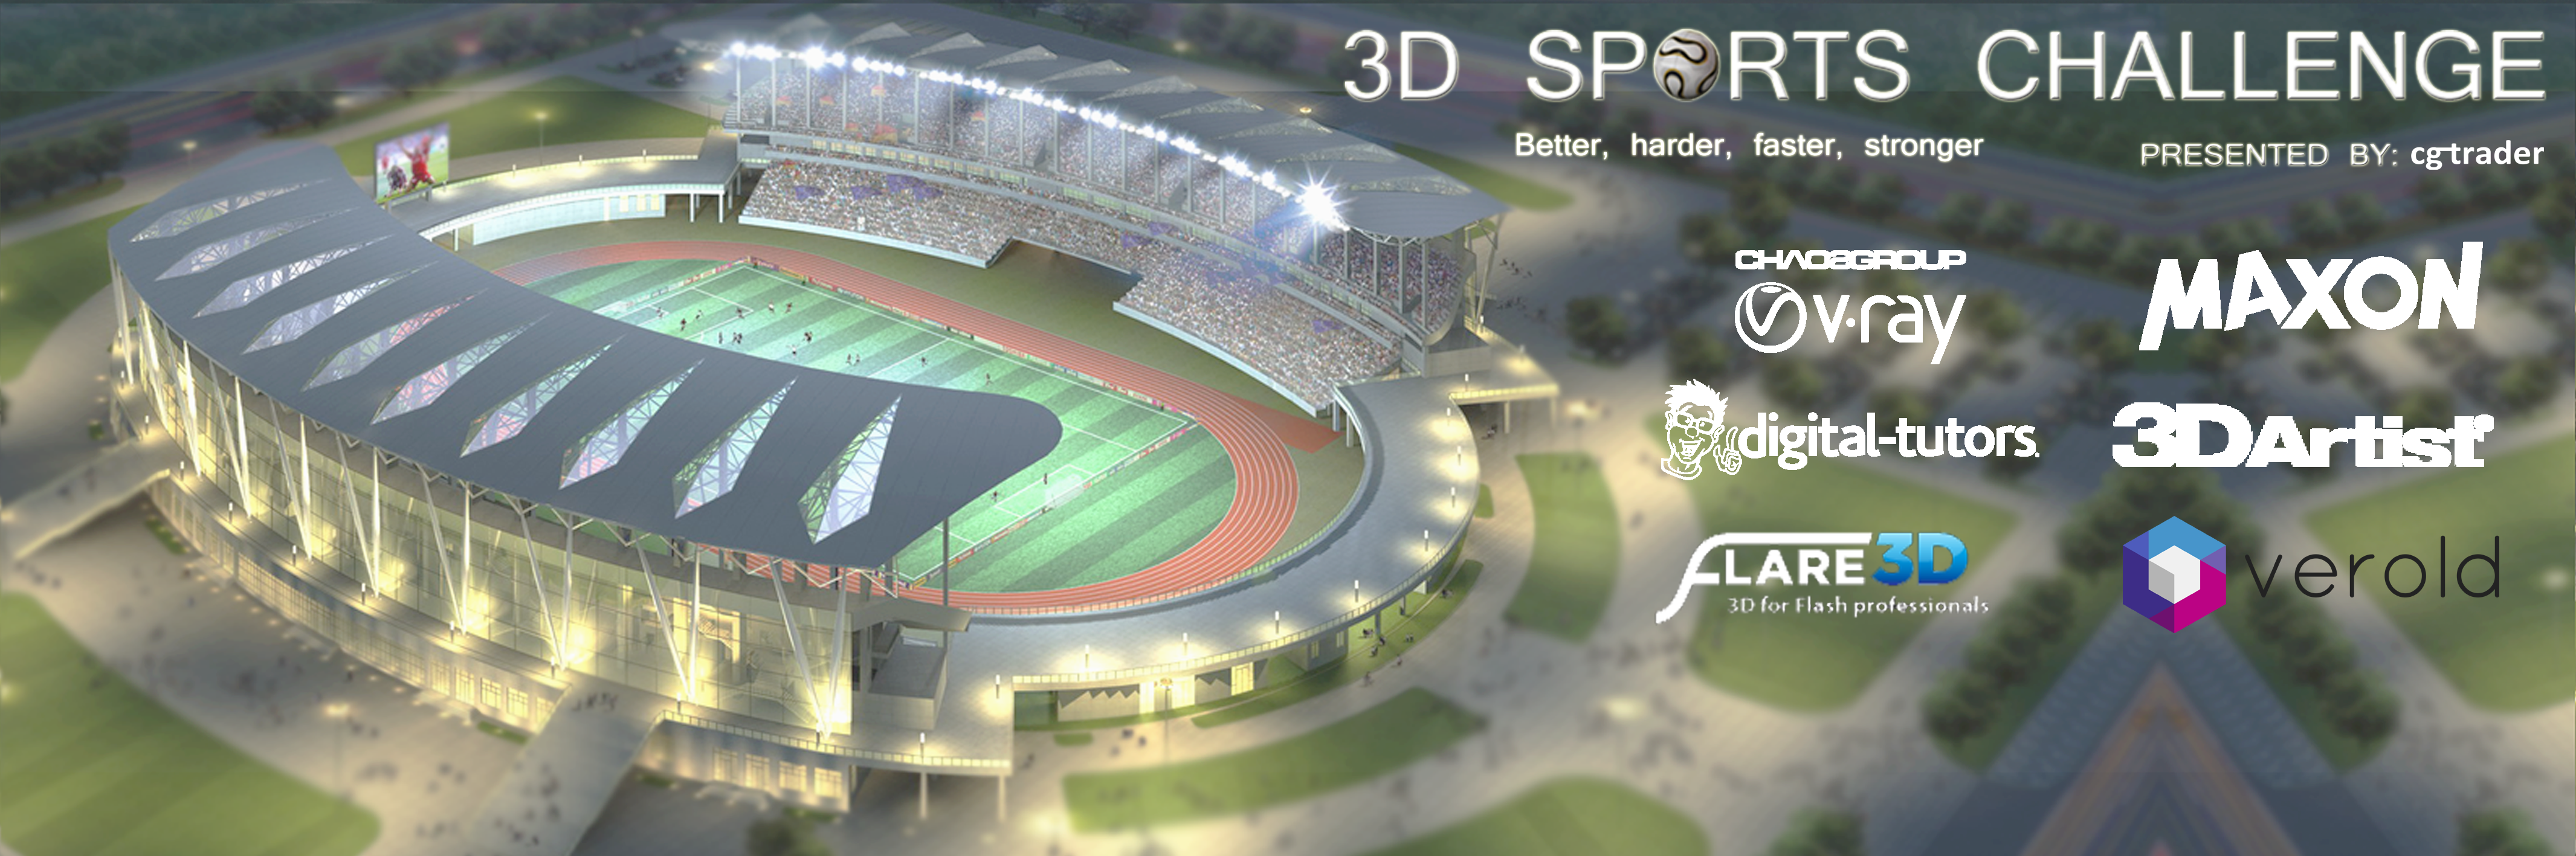 3D Sports Challenge